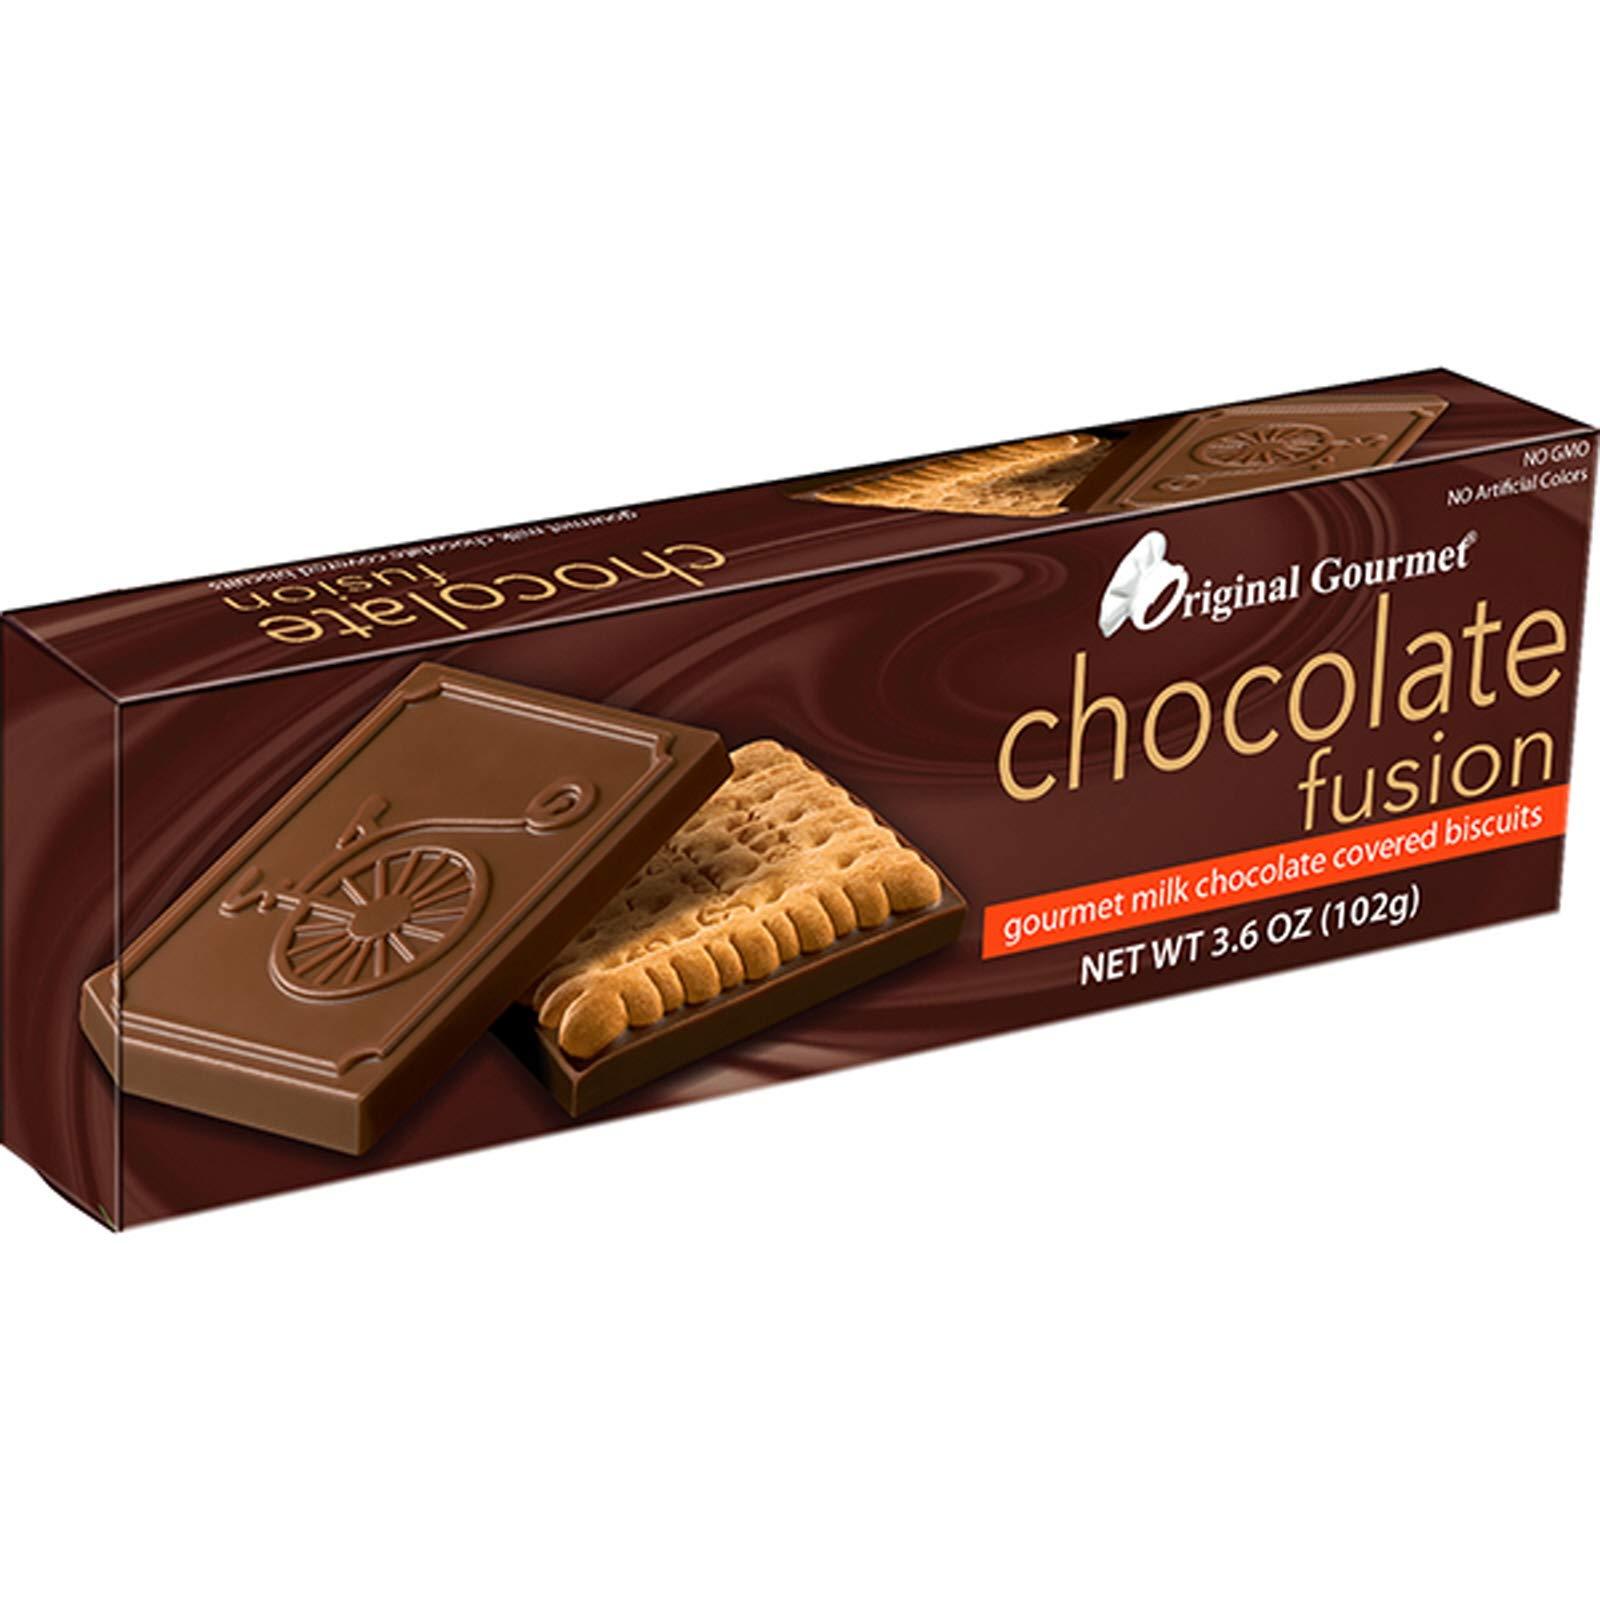 (Pack of 36) Original Gourmet Chocolate Biscuits Fusion Milk Chocolate, 3.6oz